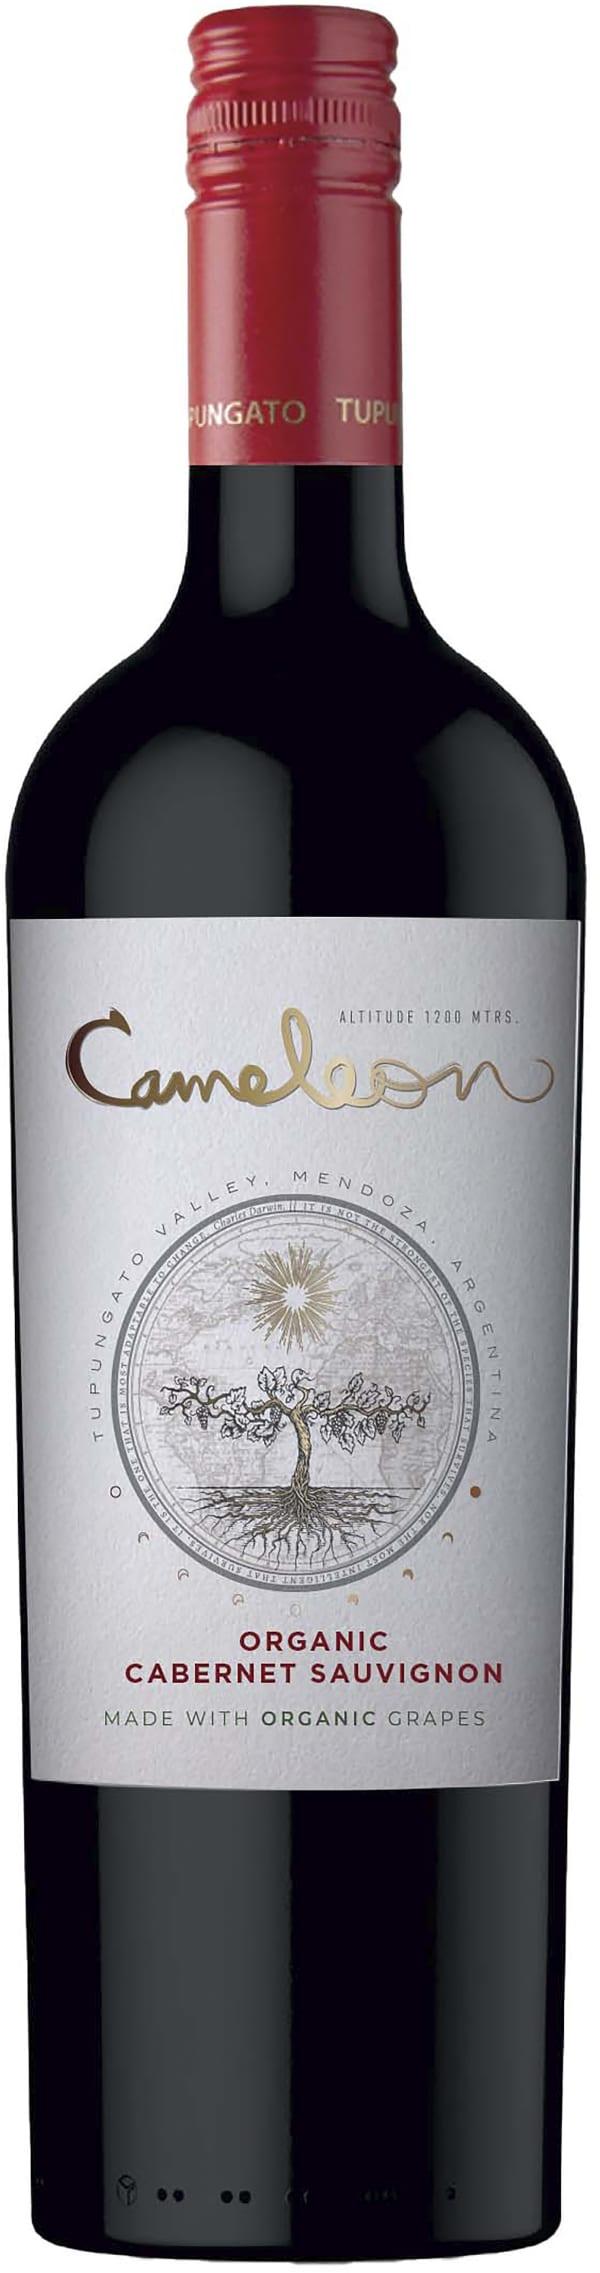 Cameleon Organic Cabernet Sauvignon 2017